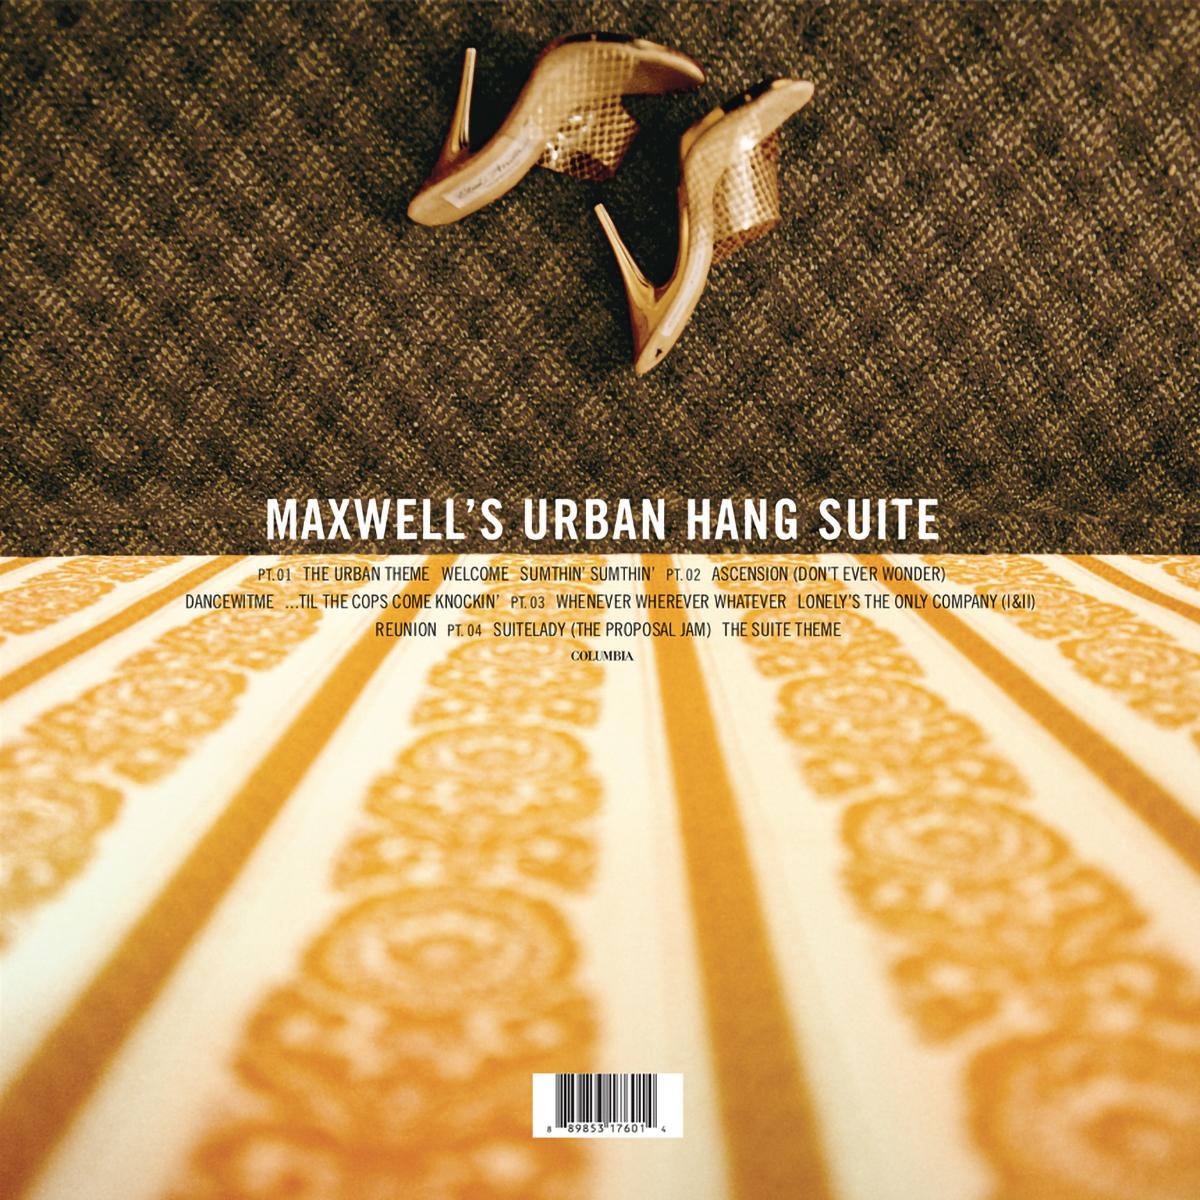 Maxwell Urban Hang Suite 2-disc LP